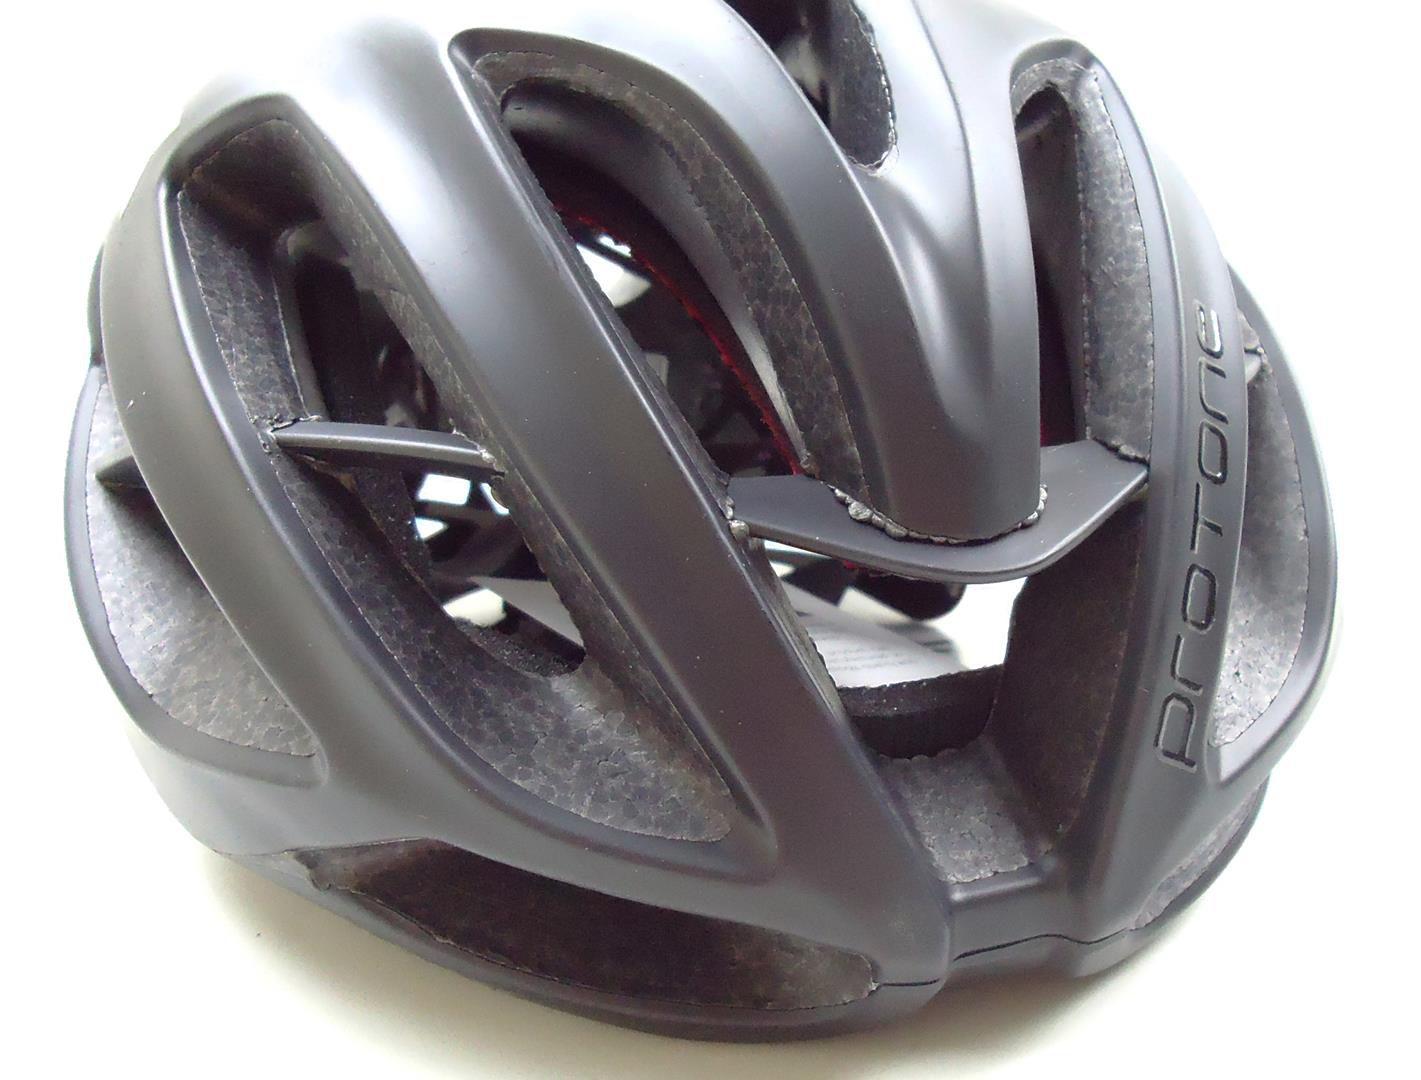 Capacete Bicicleta Protone Tamanho M ou G Cor Preto Fosco